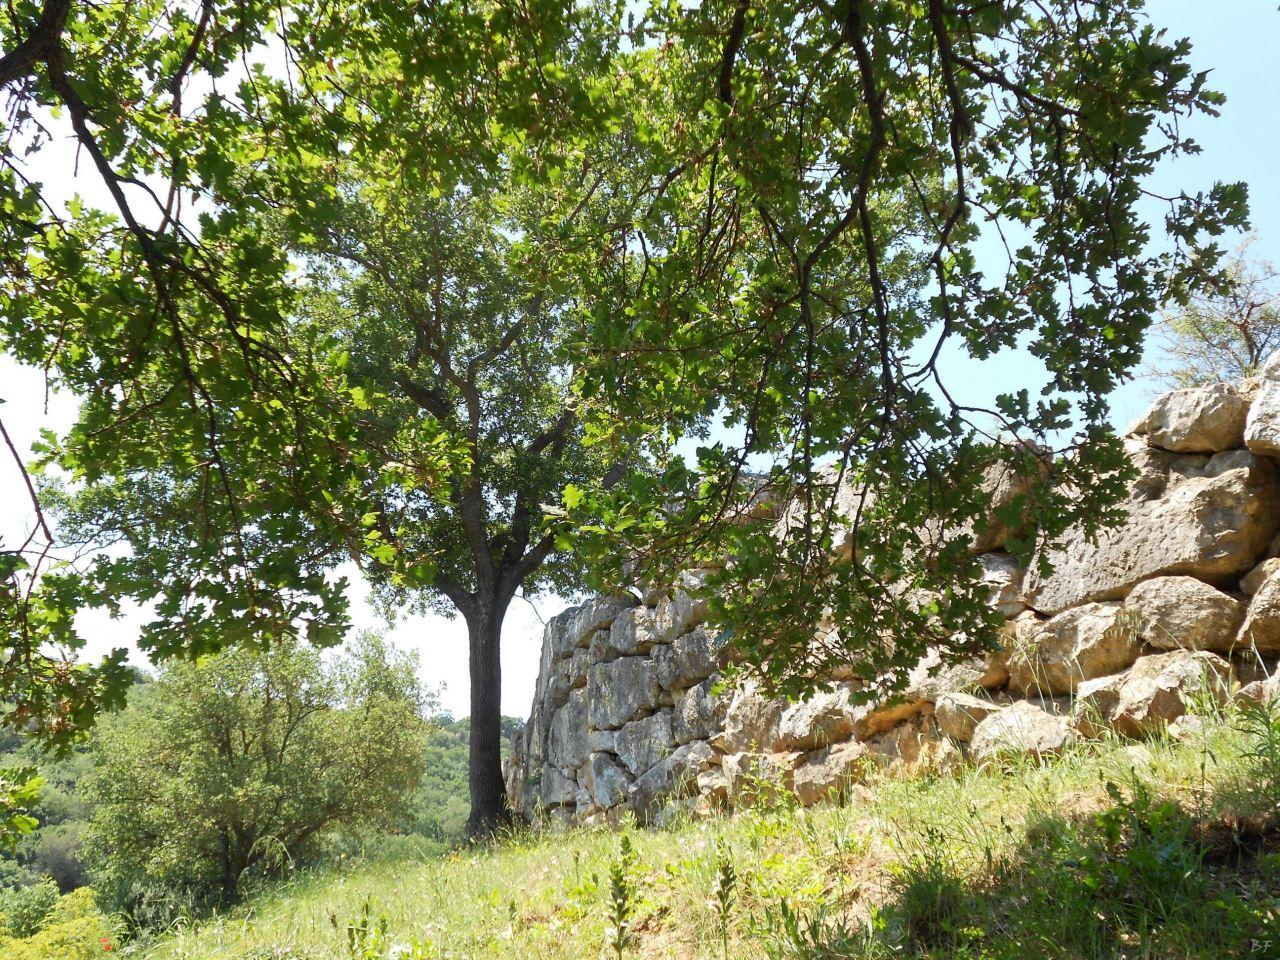 Roselle-Mura-Megalitiche-Roselle-Grosseto-Toscana-Italia-50